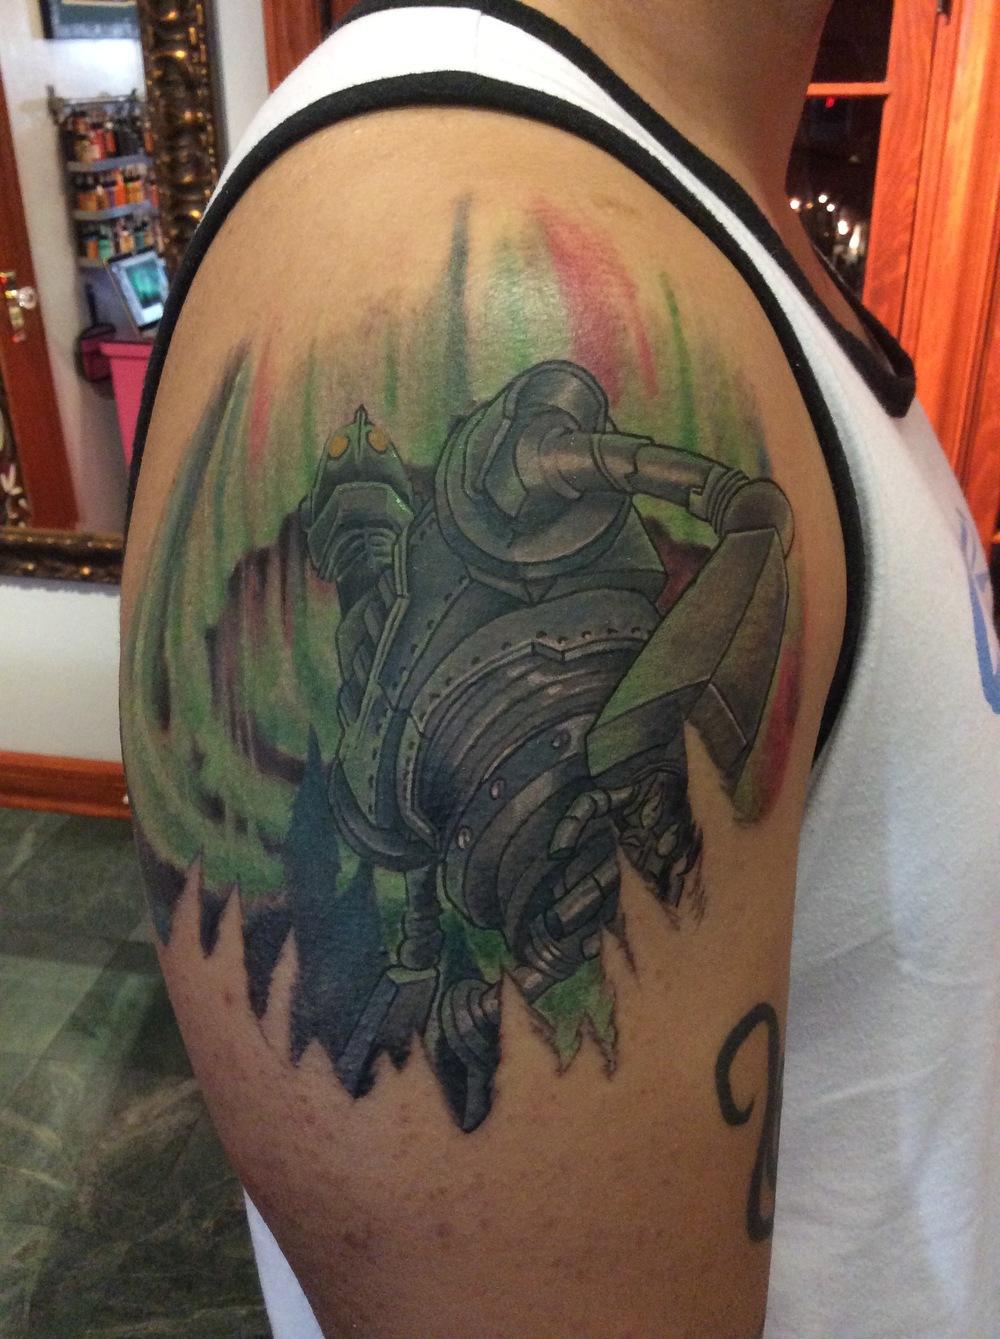 Iron_giant_tattoo.jpg